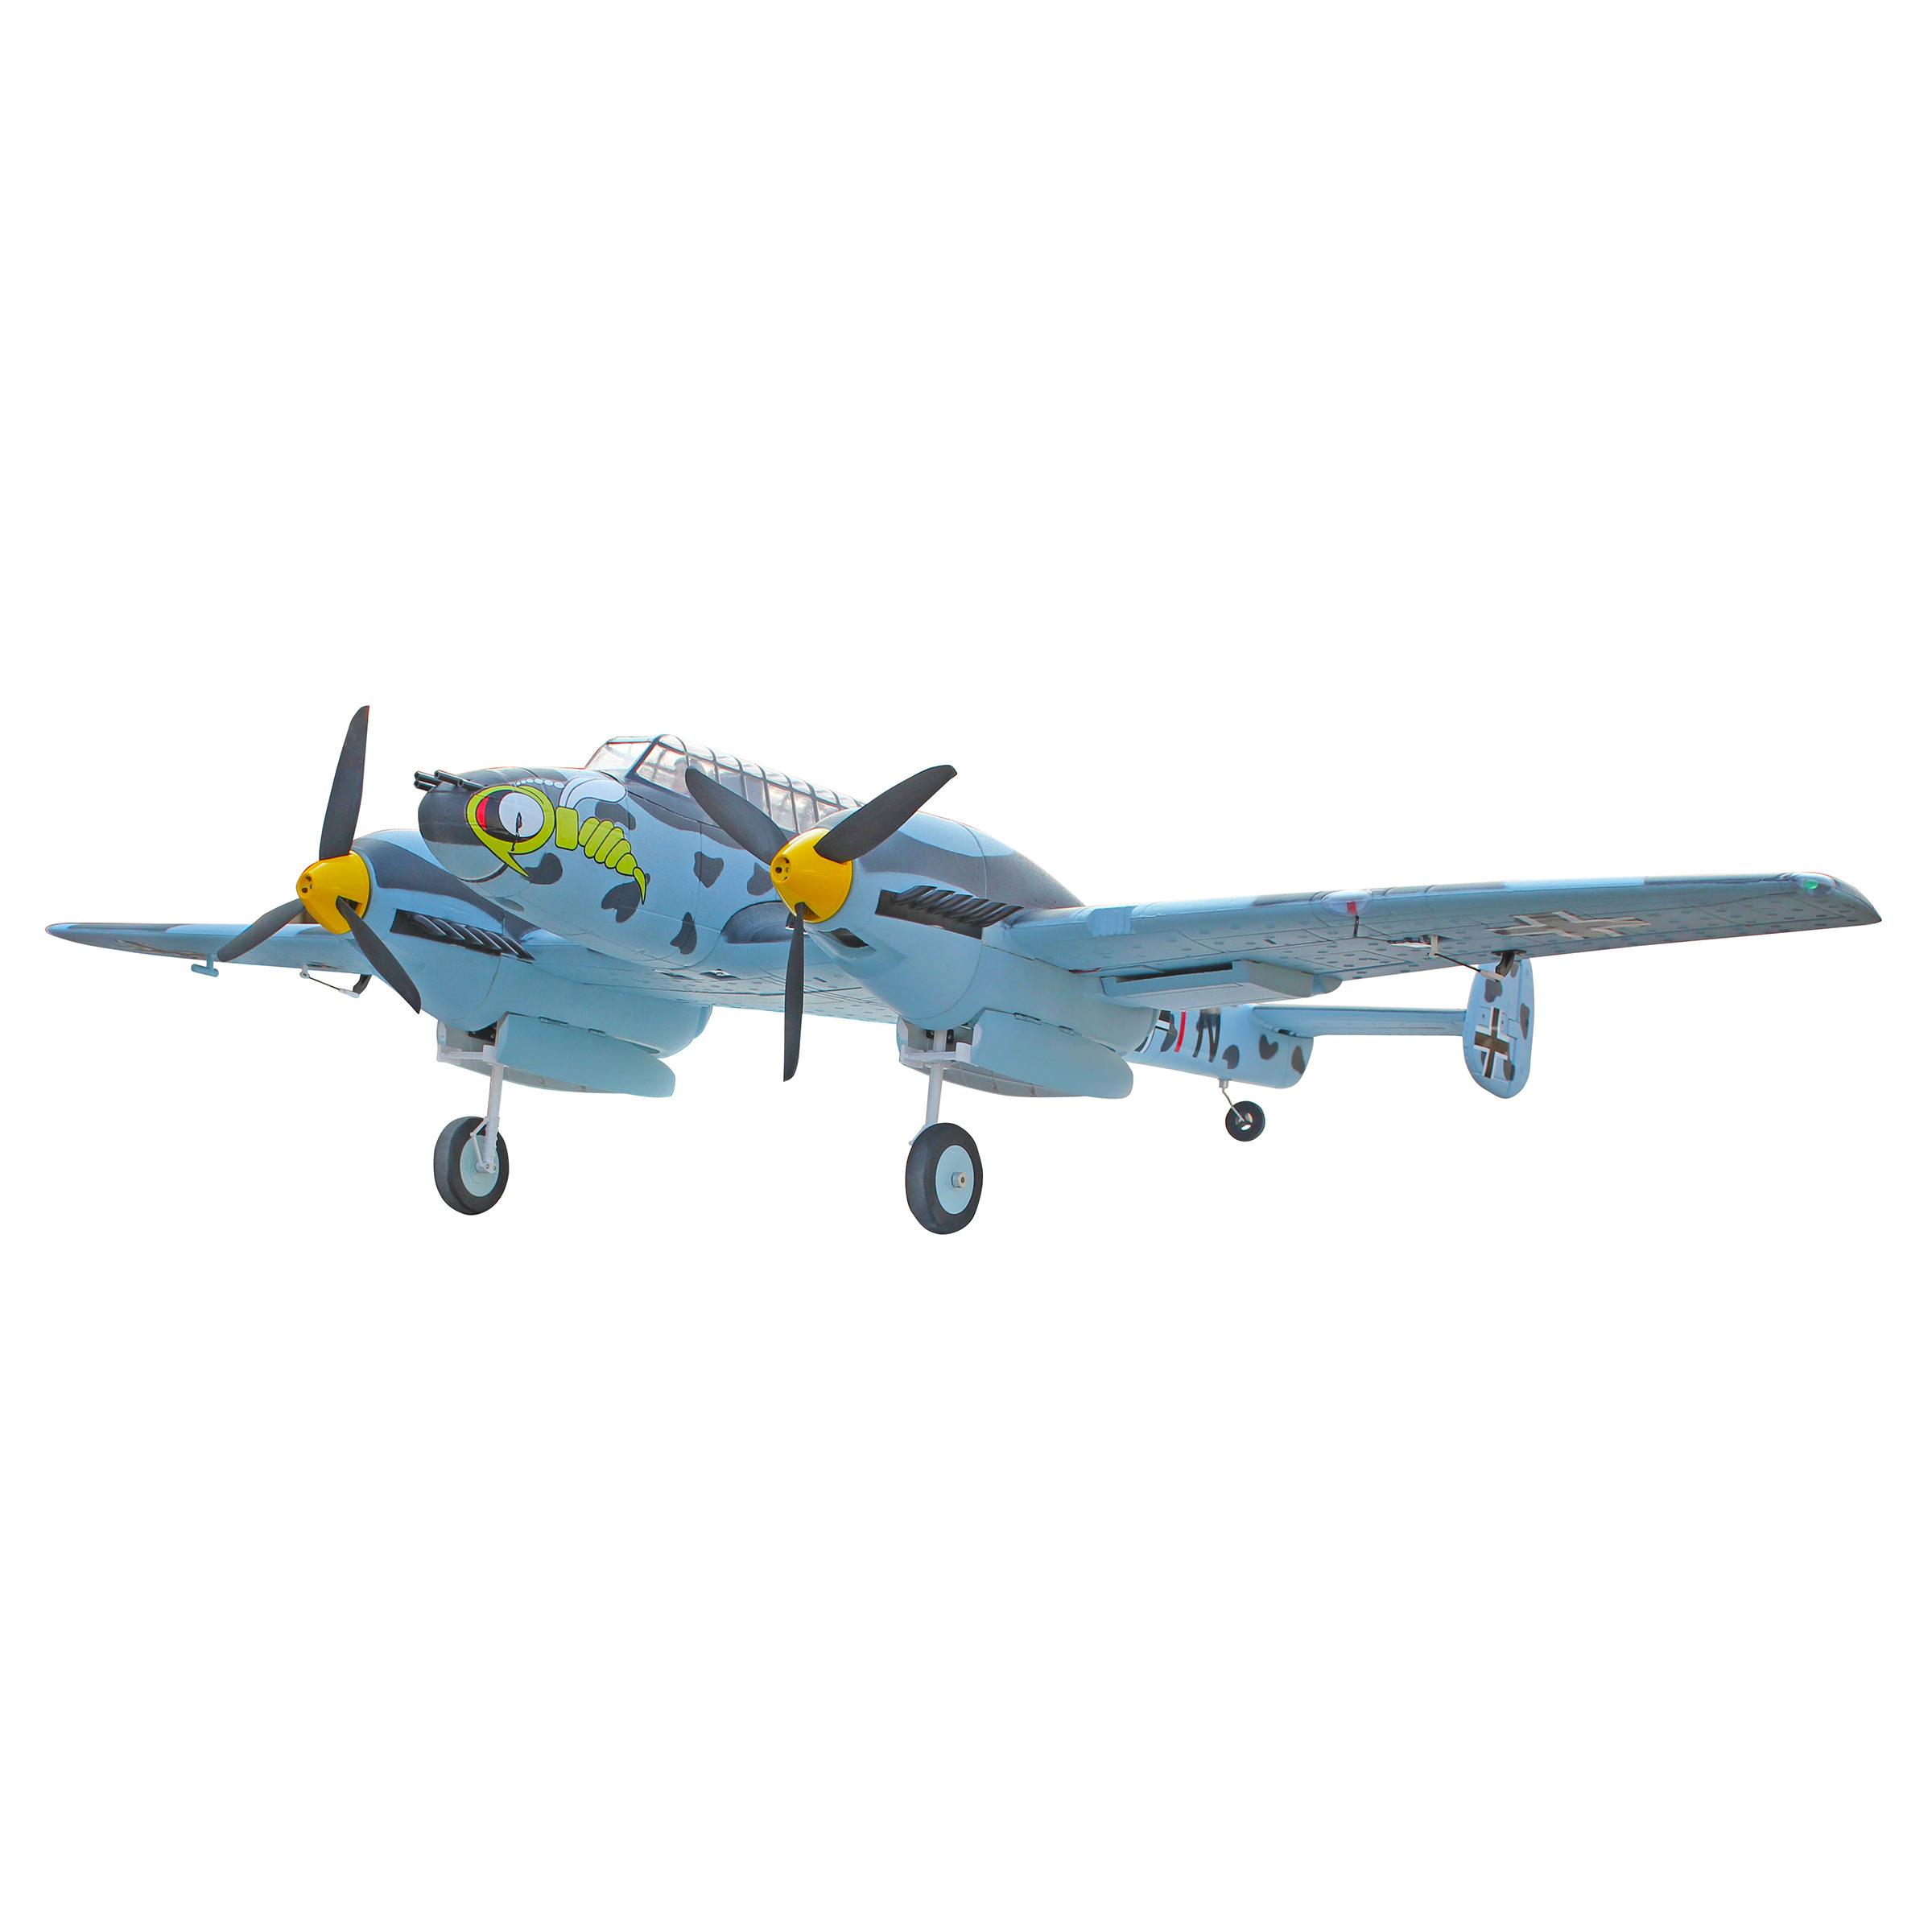 Dynam 8963 Messerschmitt BF-110 RC Plane W/retracts Radio